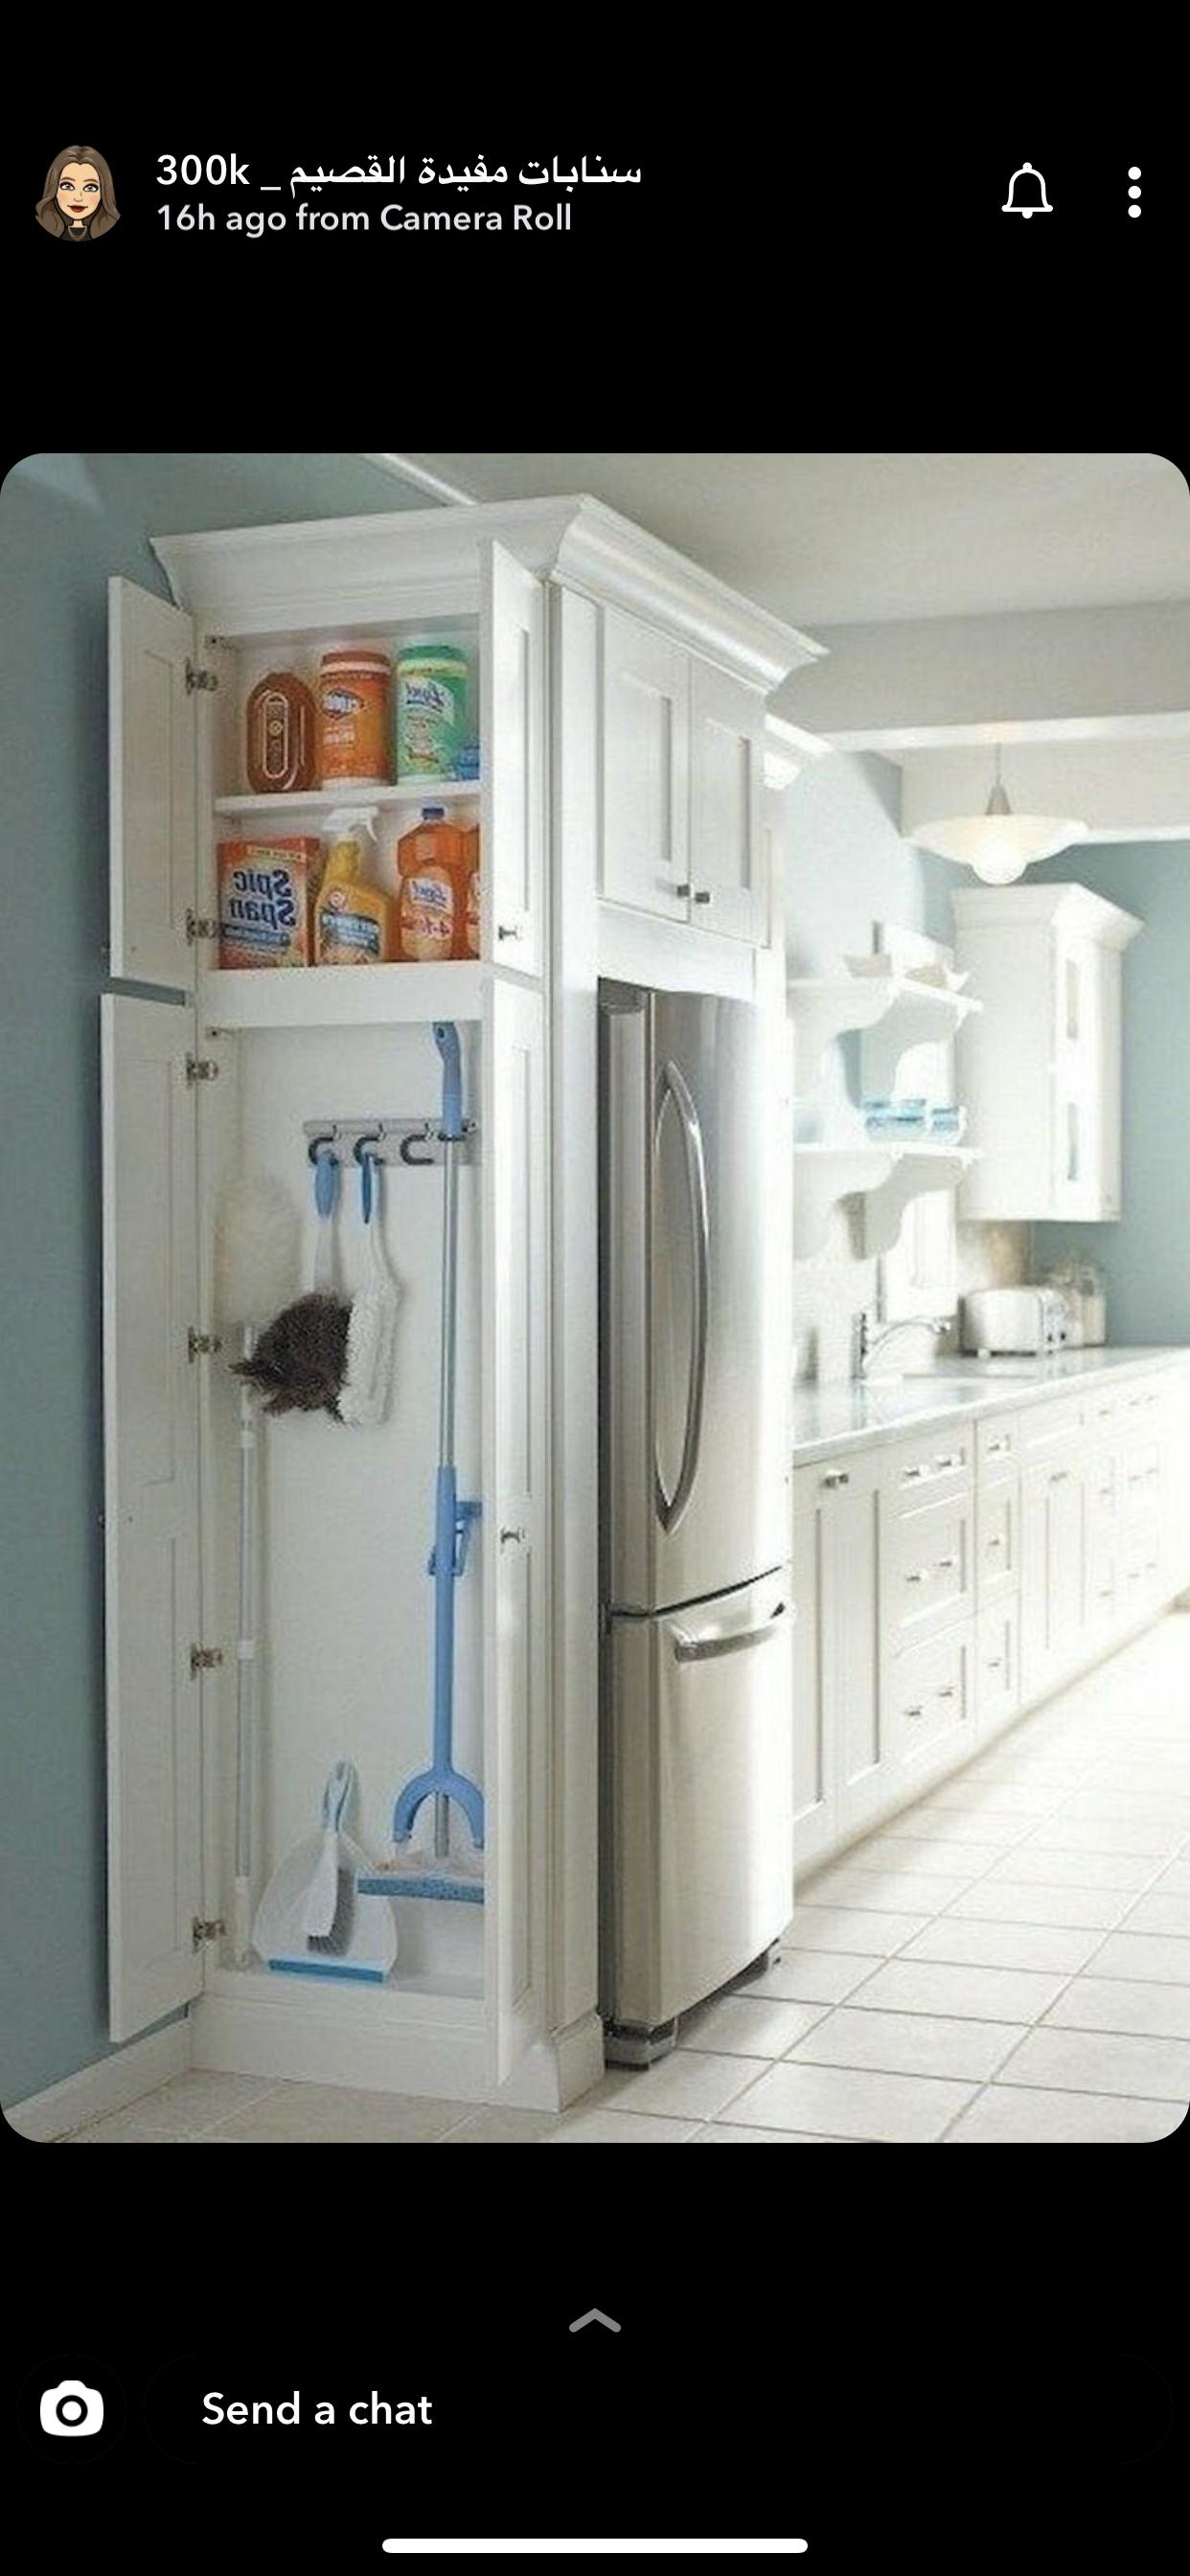 Pin By Maryam Alali On المنزل In 2020 French Door Refrigerator